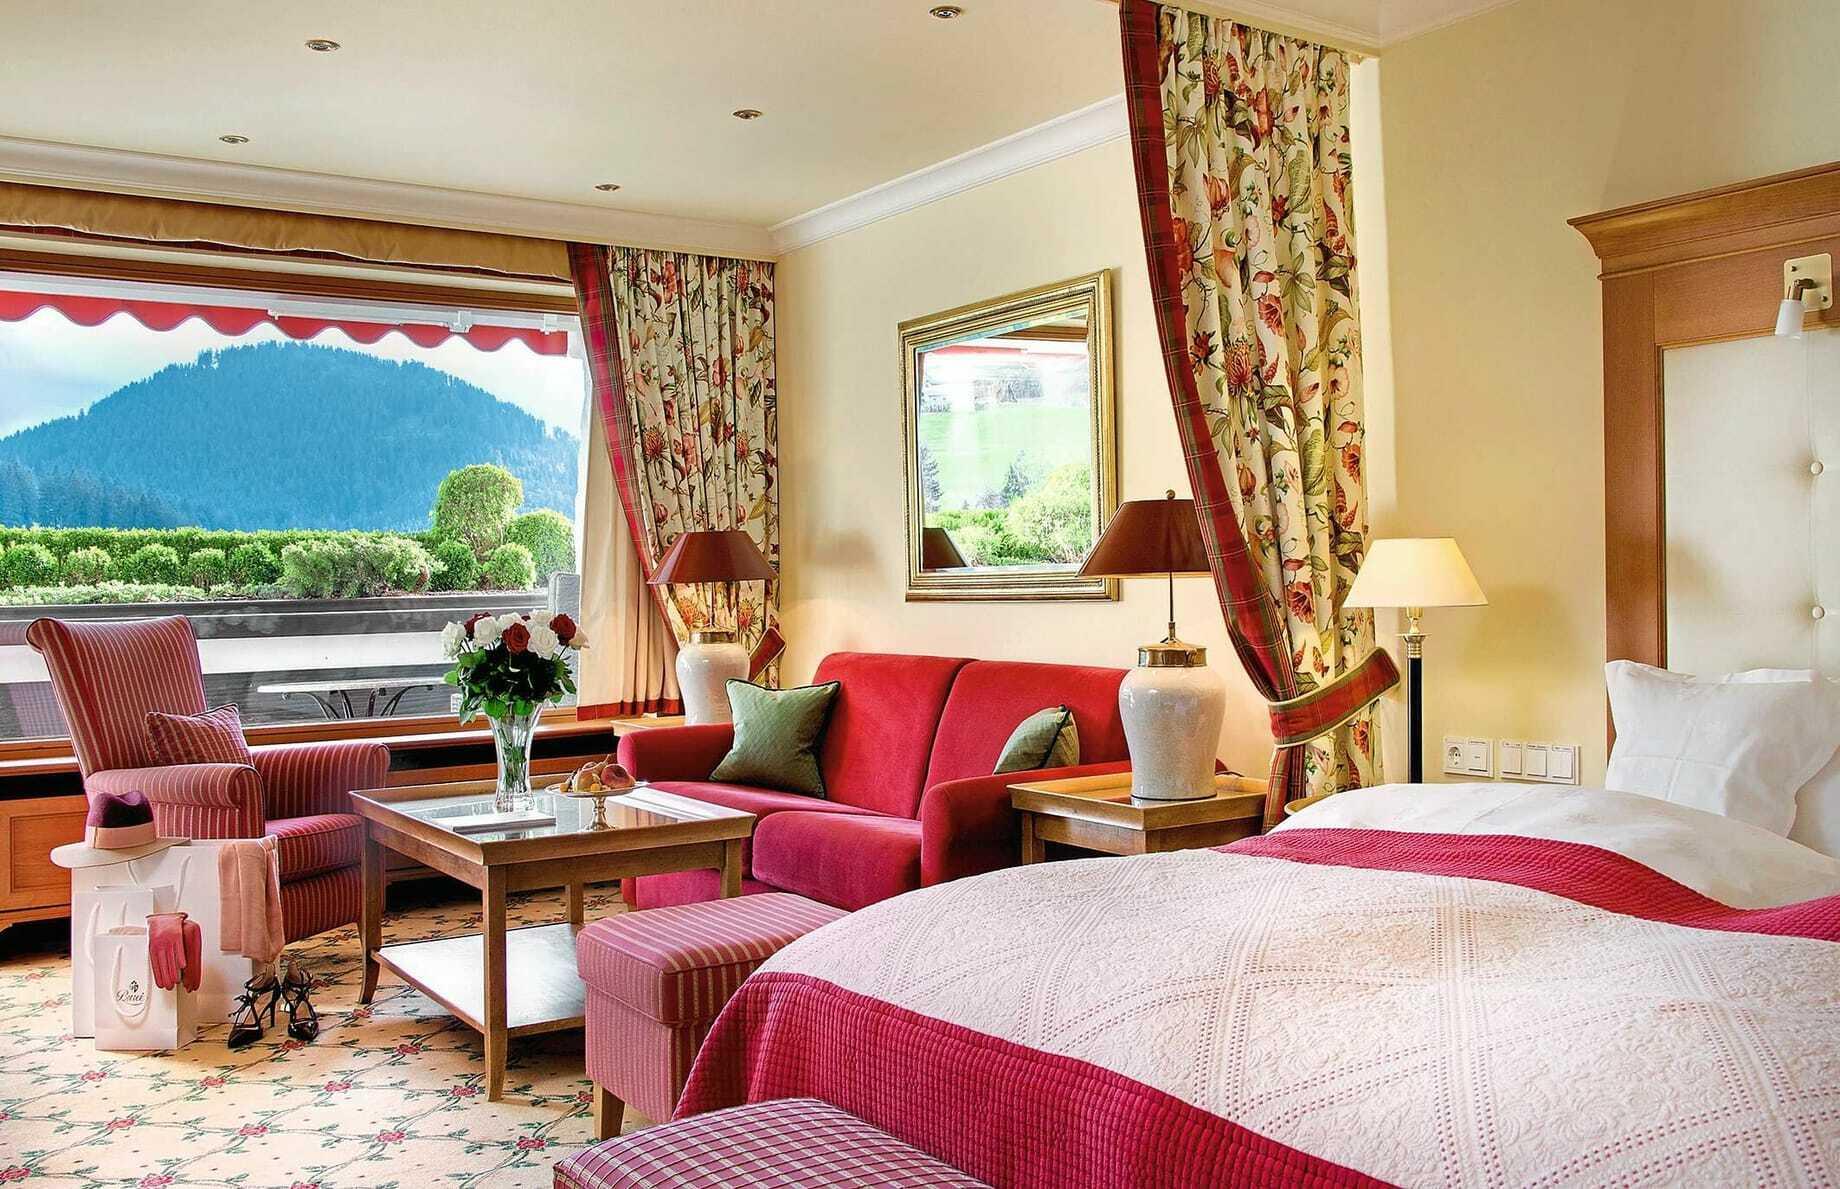 Hotel schwarzwald single